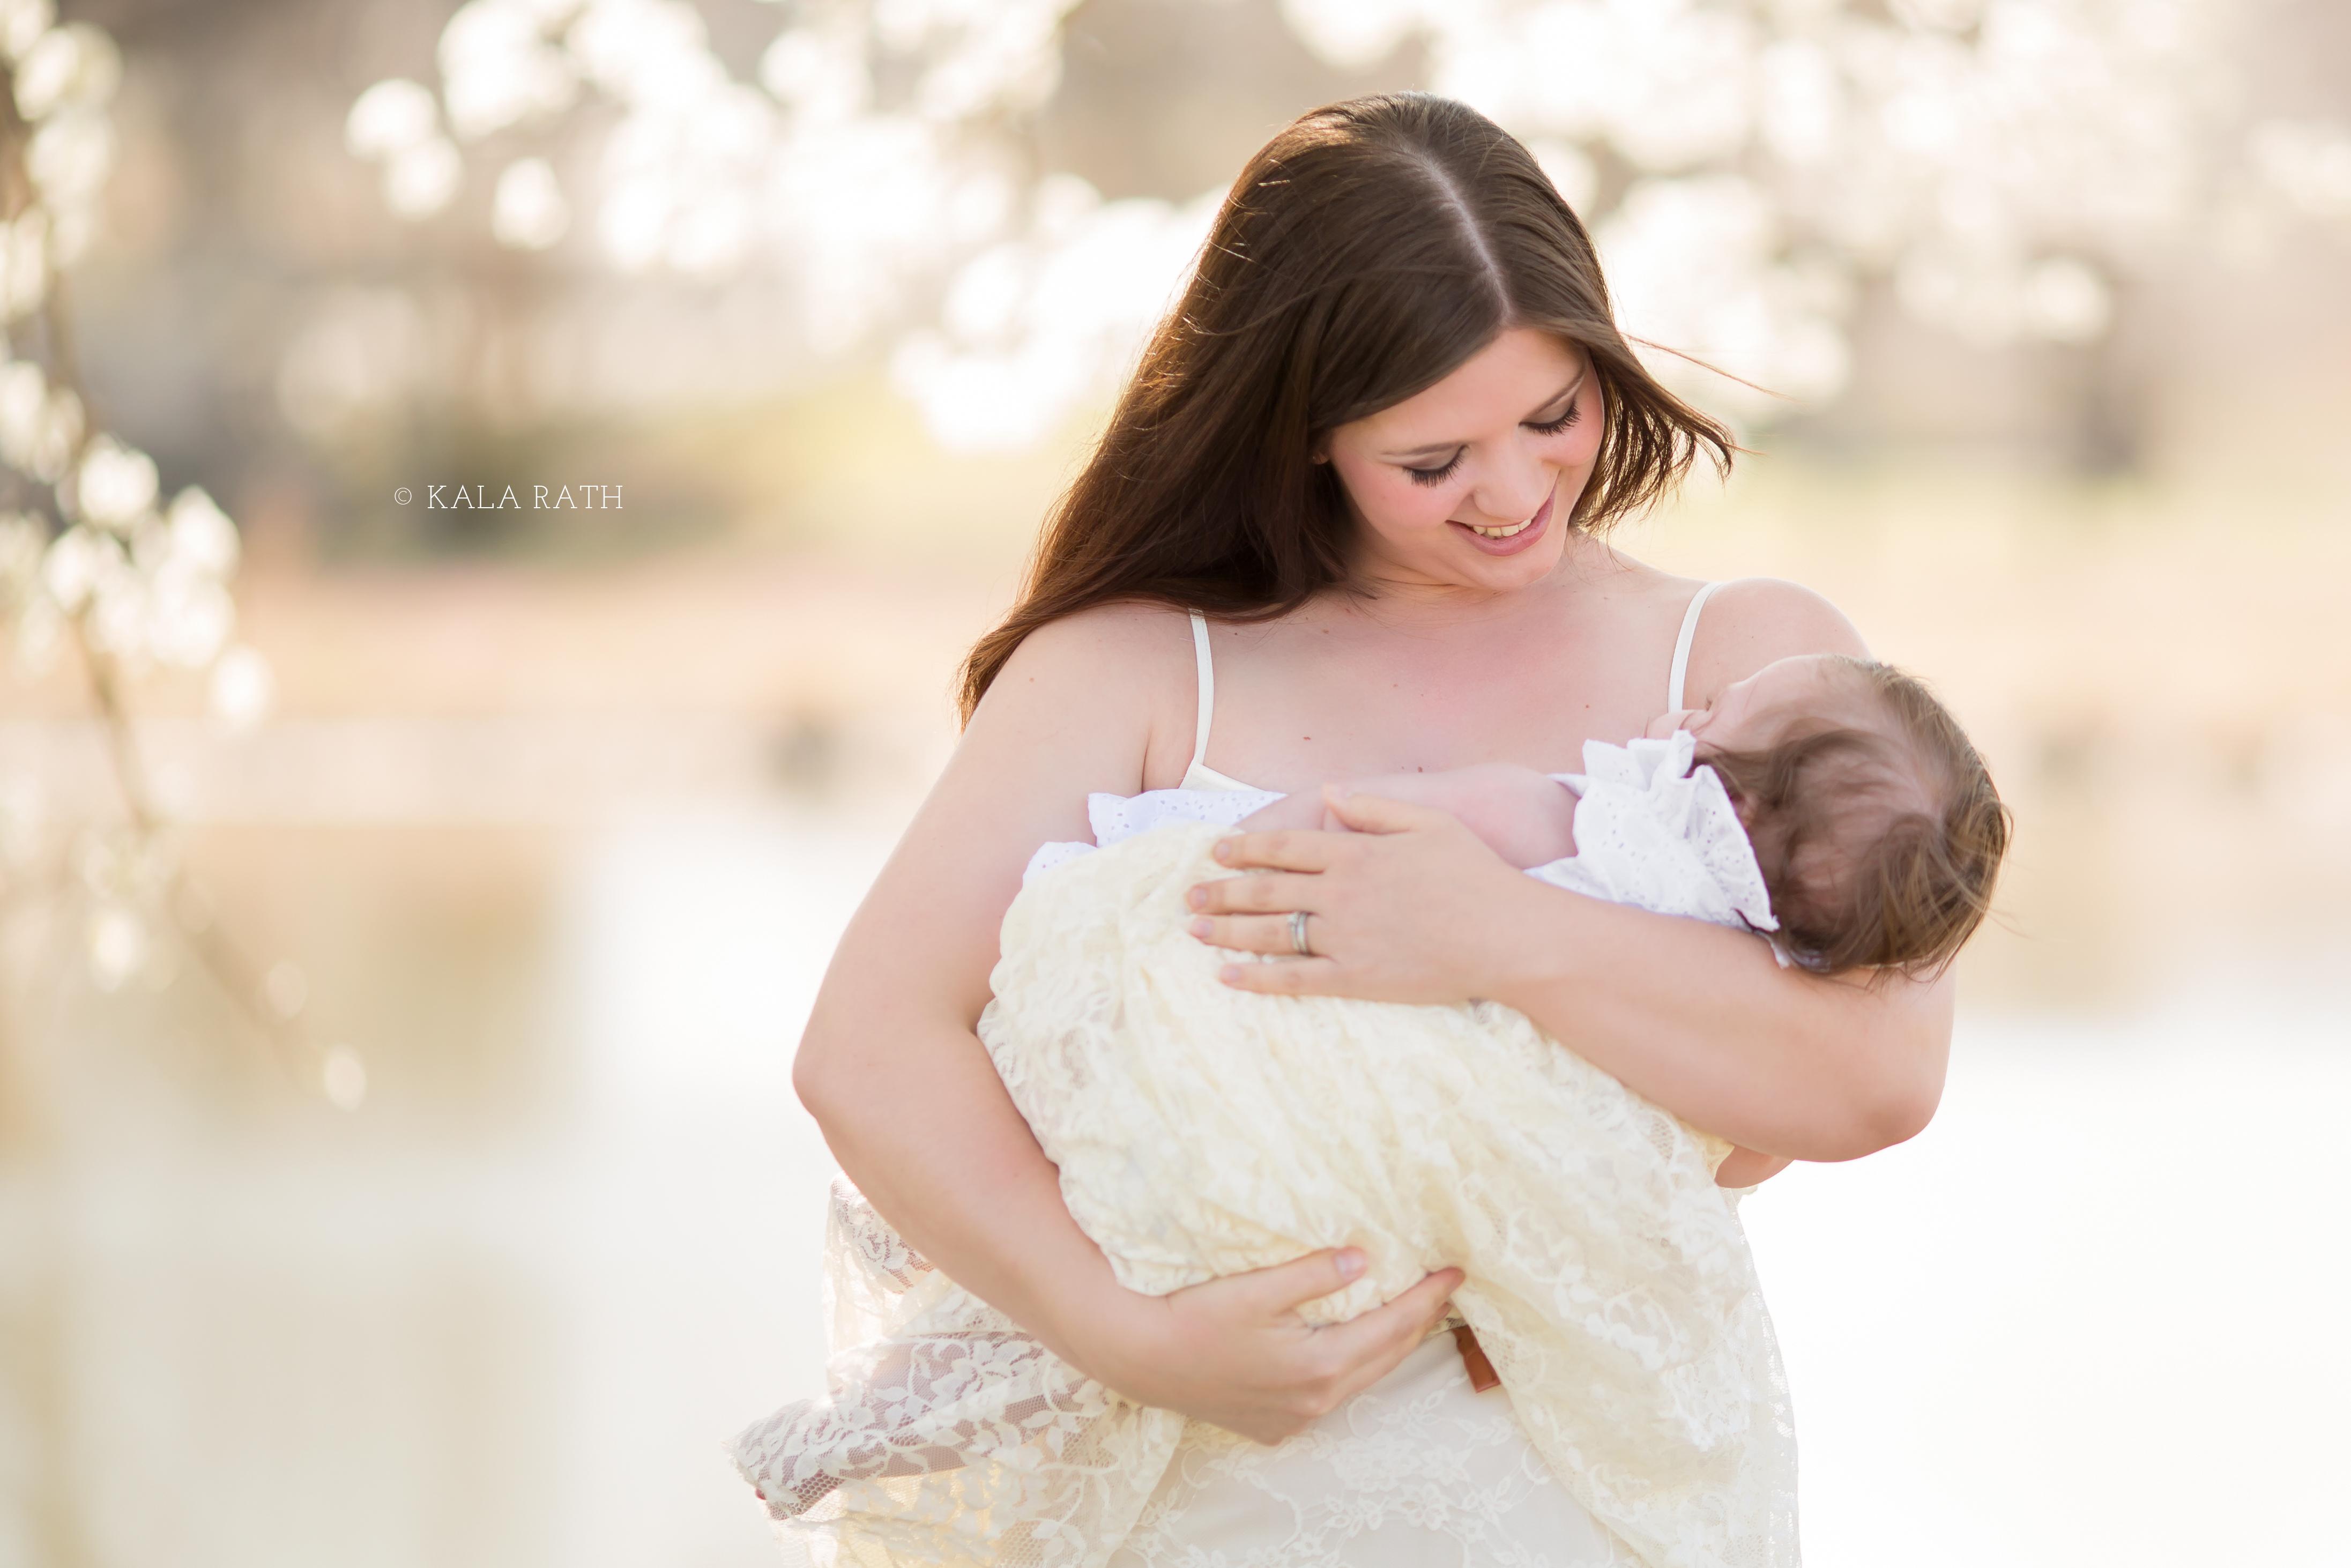 Fort Smith Baby Photographer - Kala Rath Photography